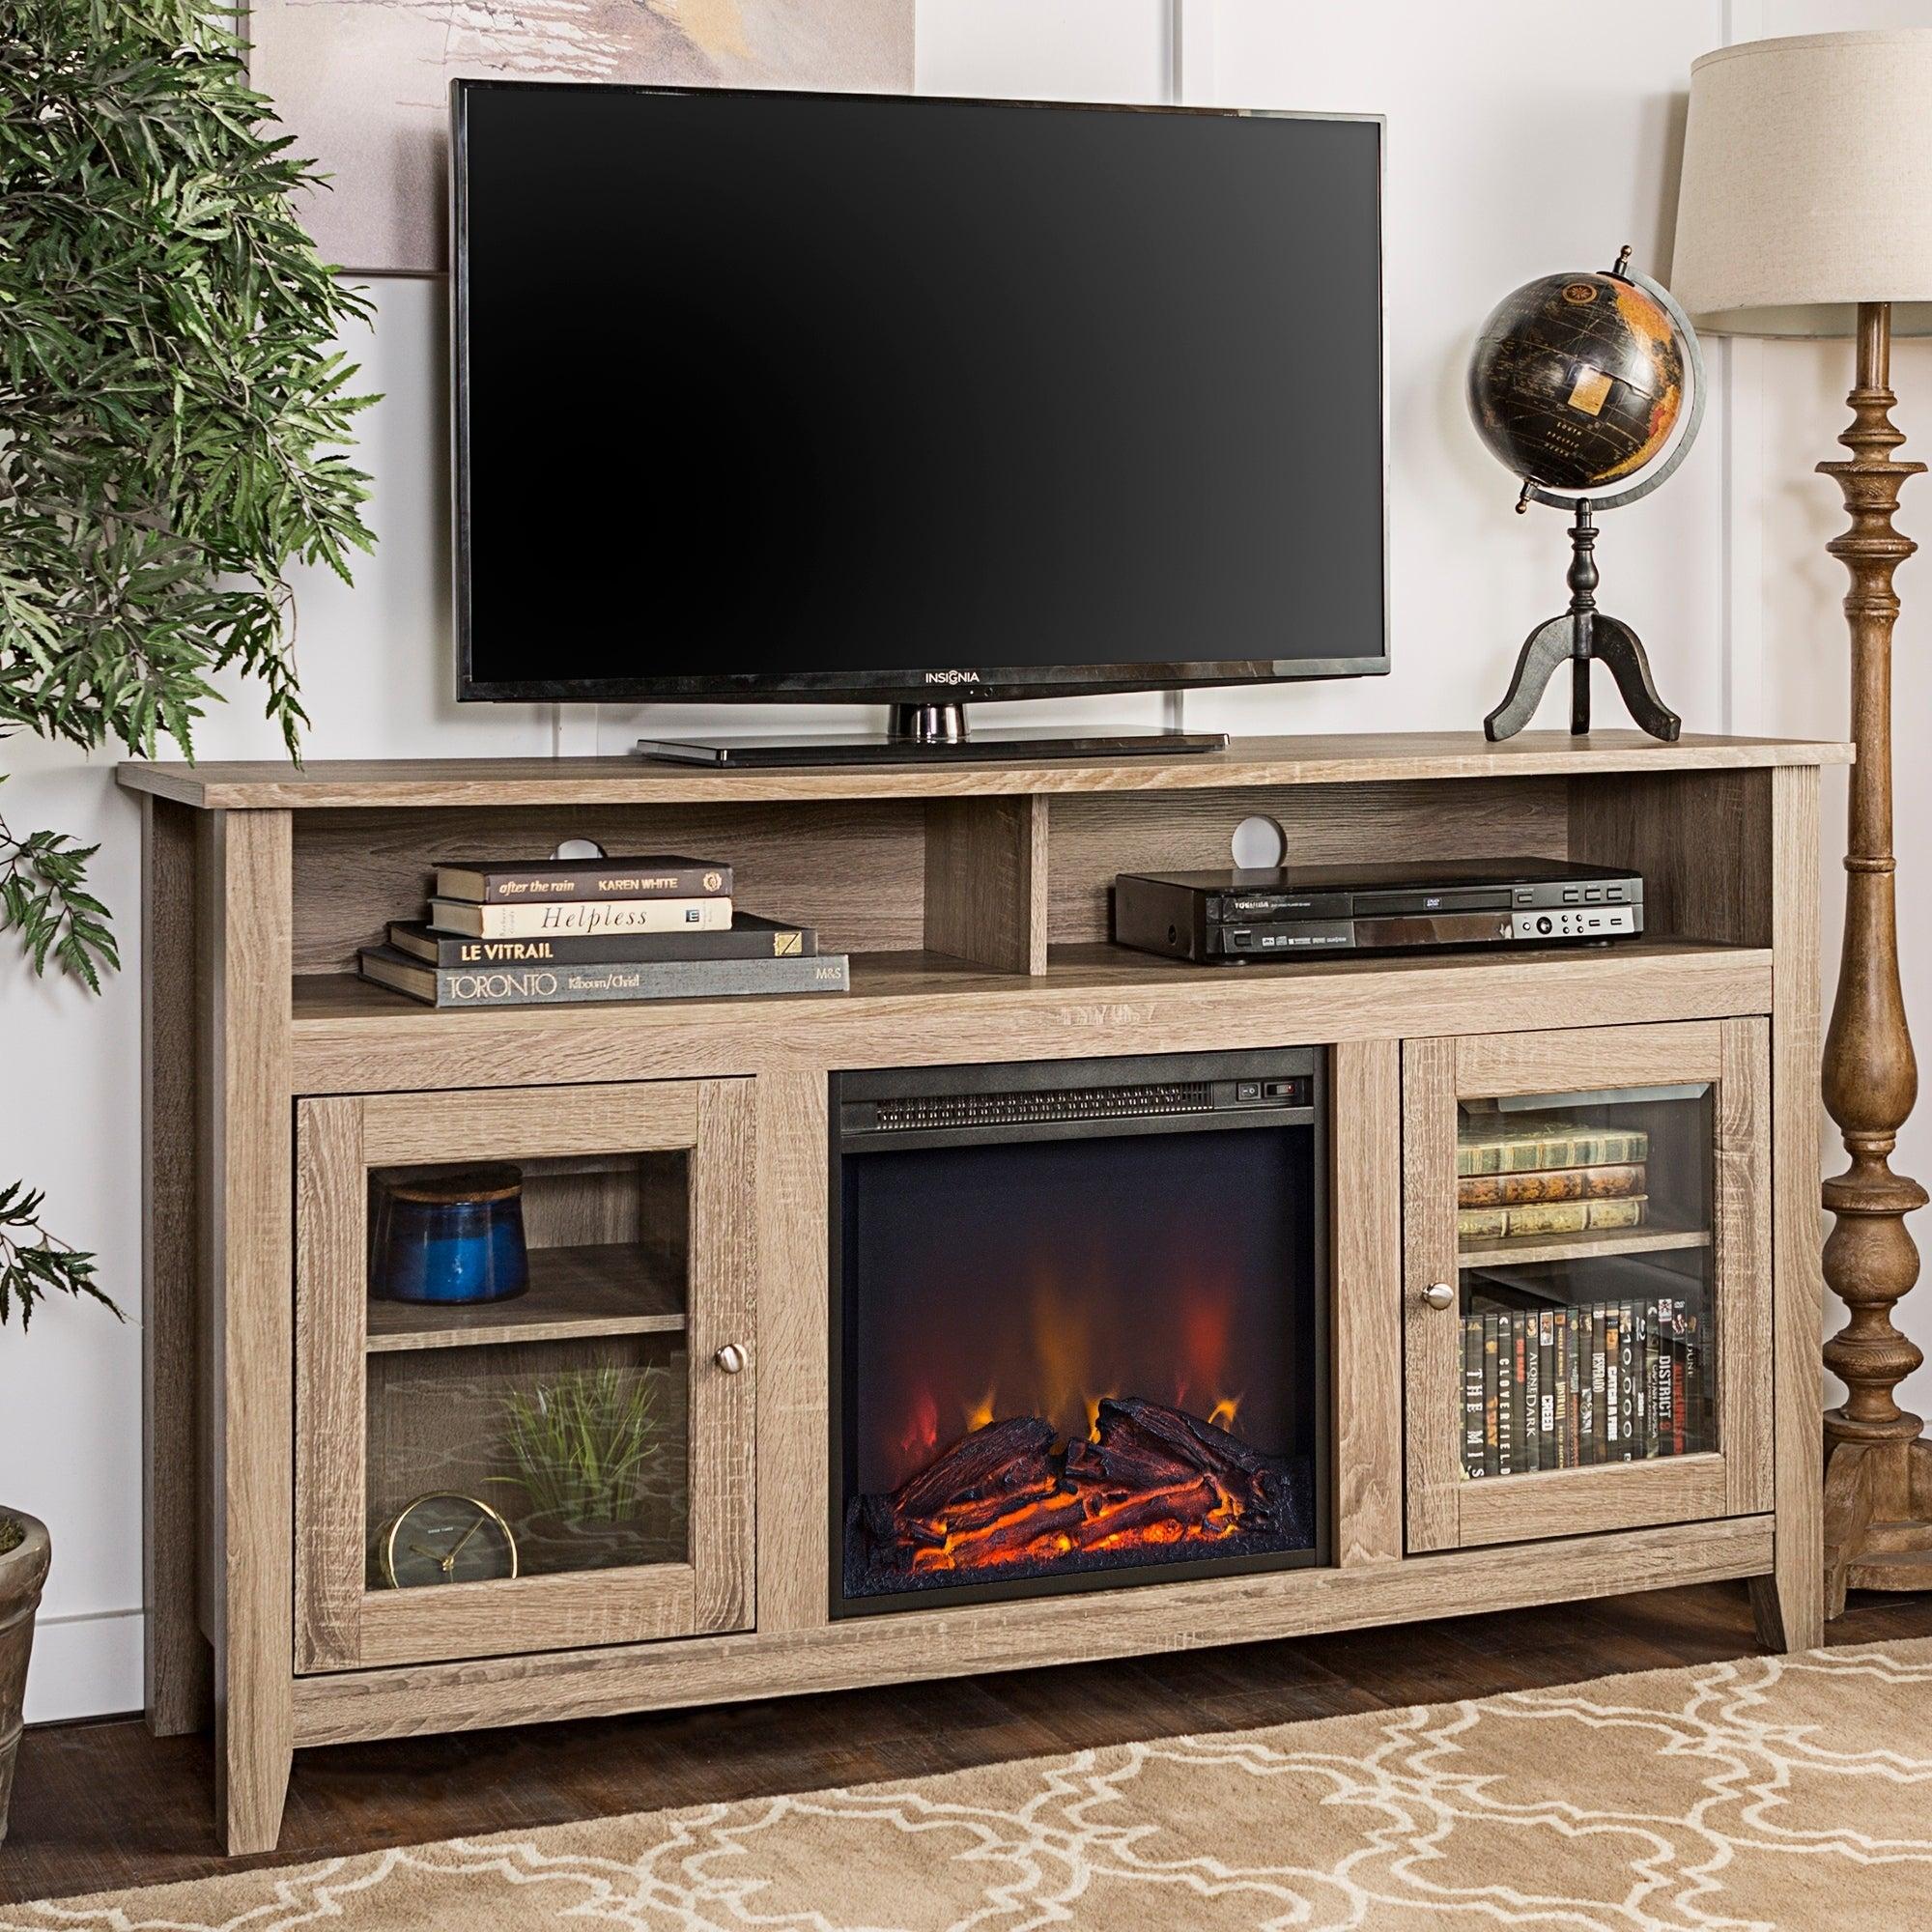 Shop 58 Highboy Fireplace Tv Stand Console Driftwood 58 X 16 X